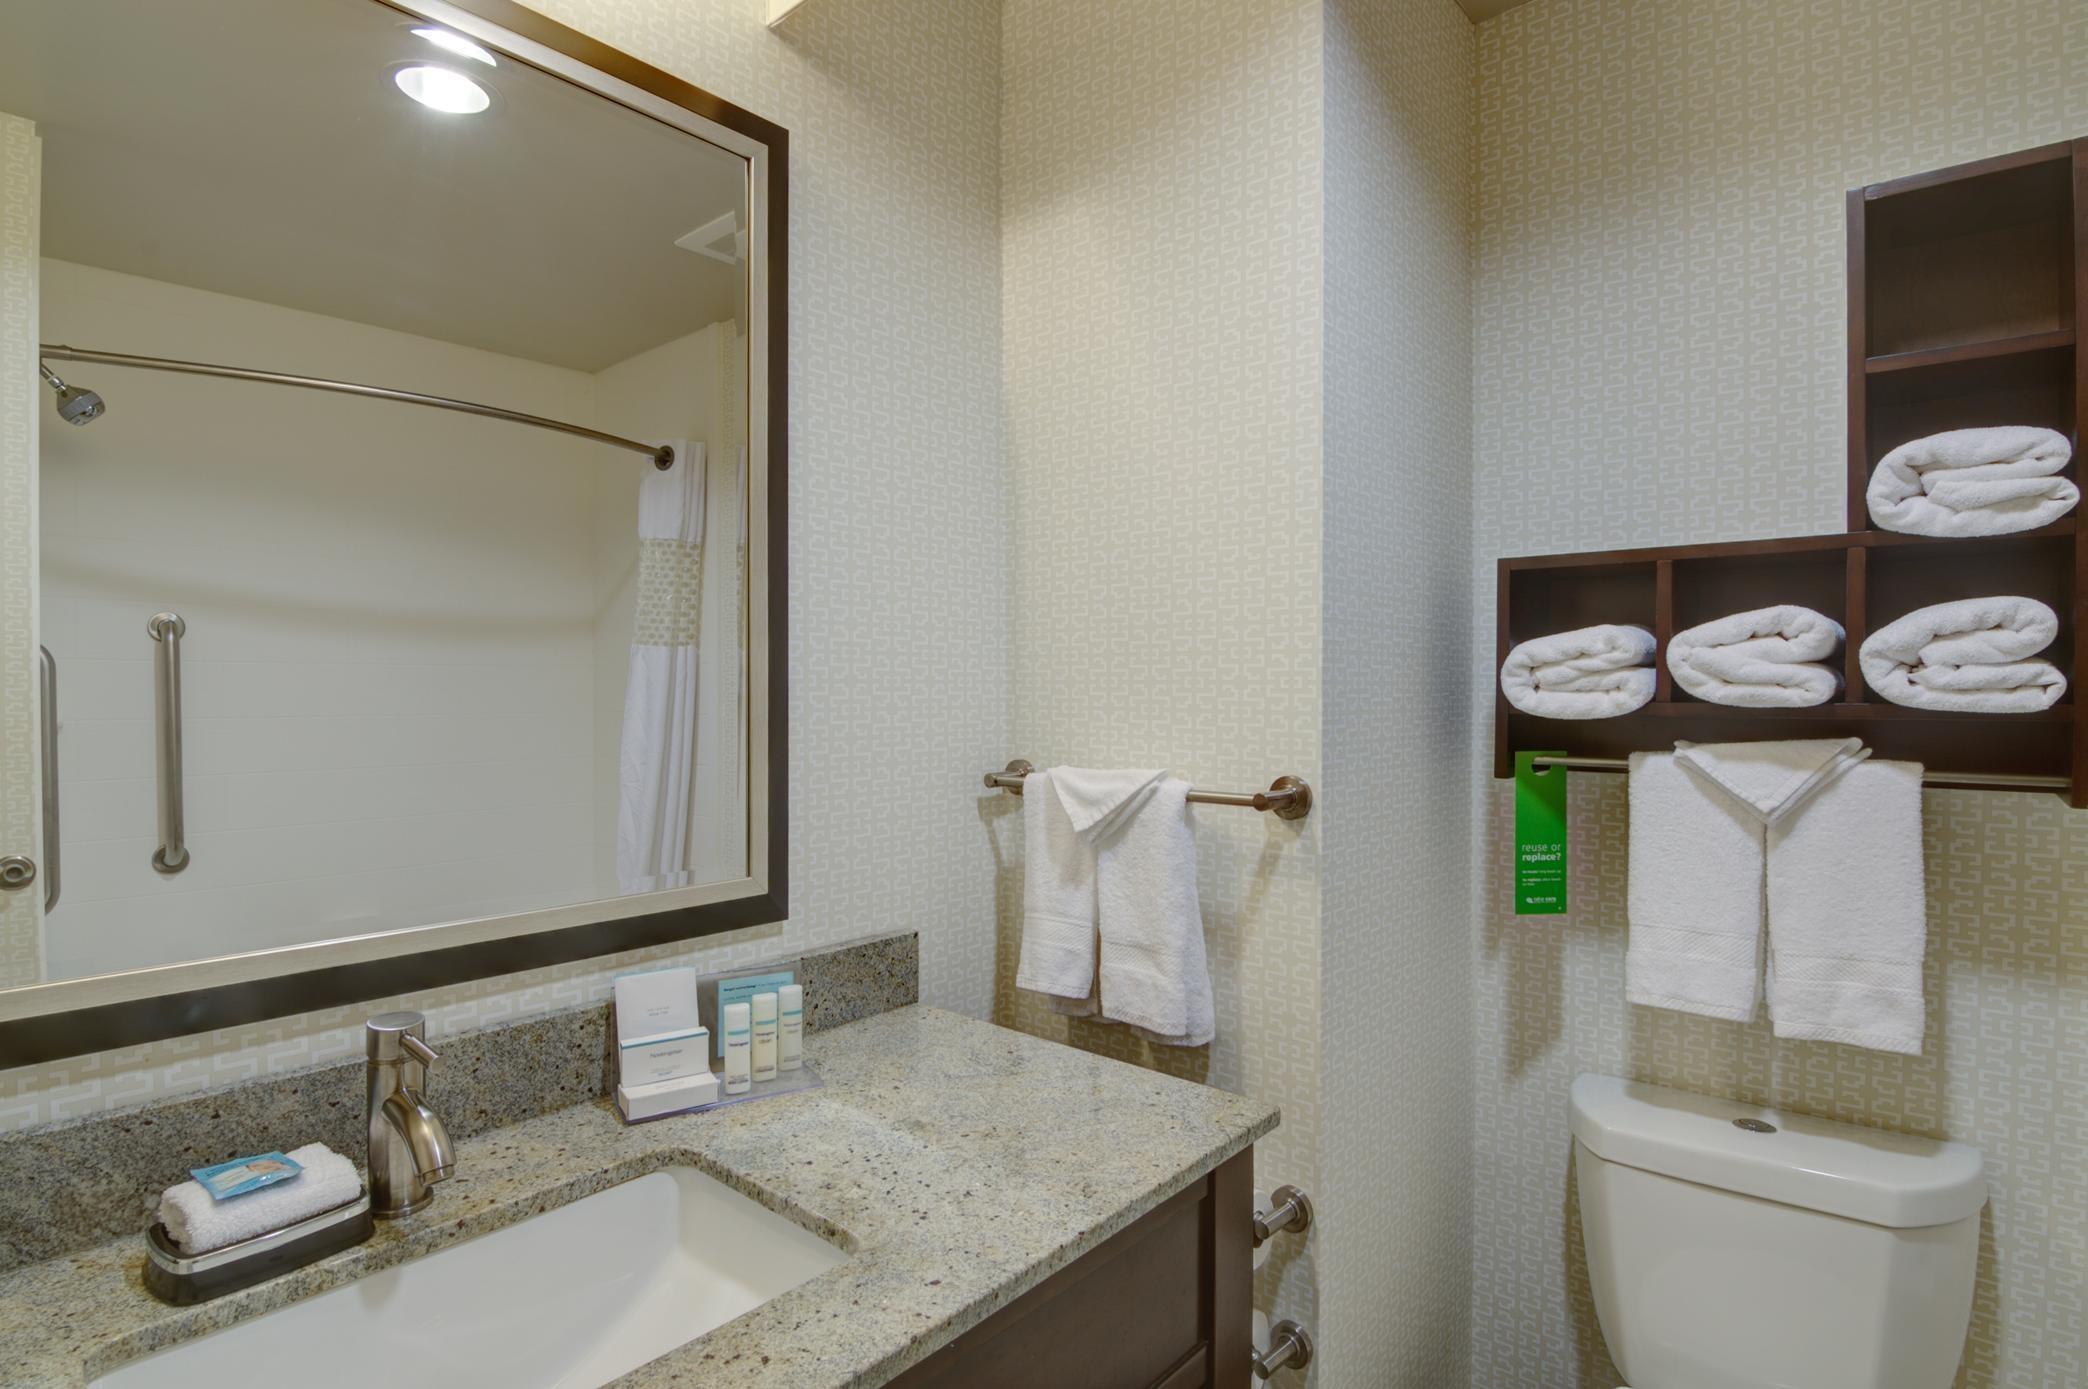 Hampton Inn & Suites Trophy Club - Fort Worth North image 26